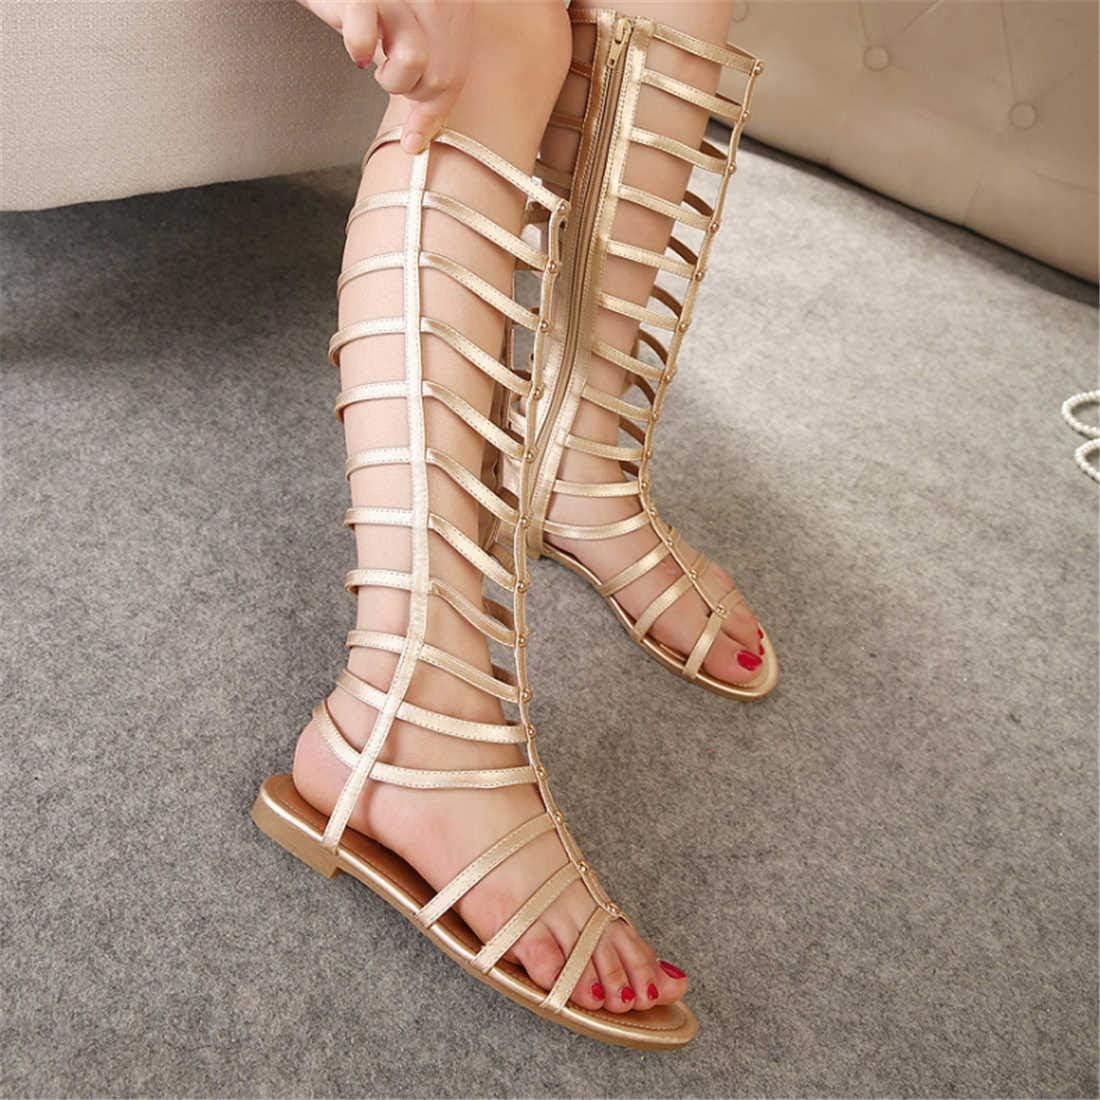 BZBZBZ Ginocchio Fredda Boot Open Toe Hollow Zipper Roma Dress Sandals EU Formato 35-40 Golden